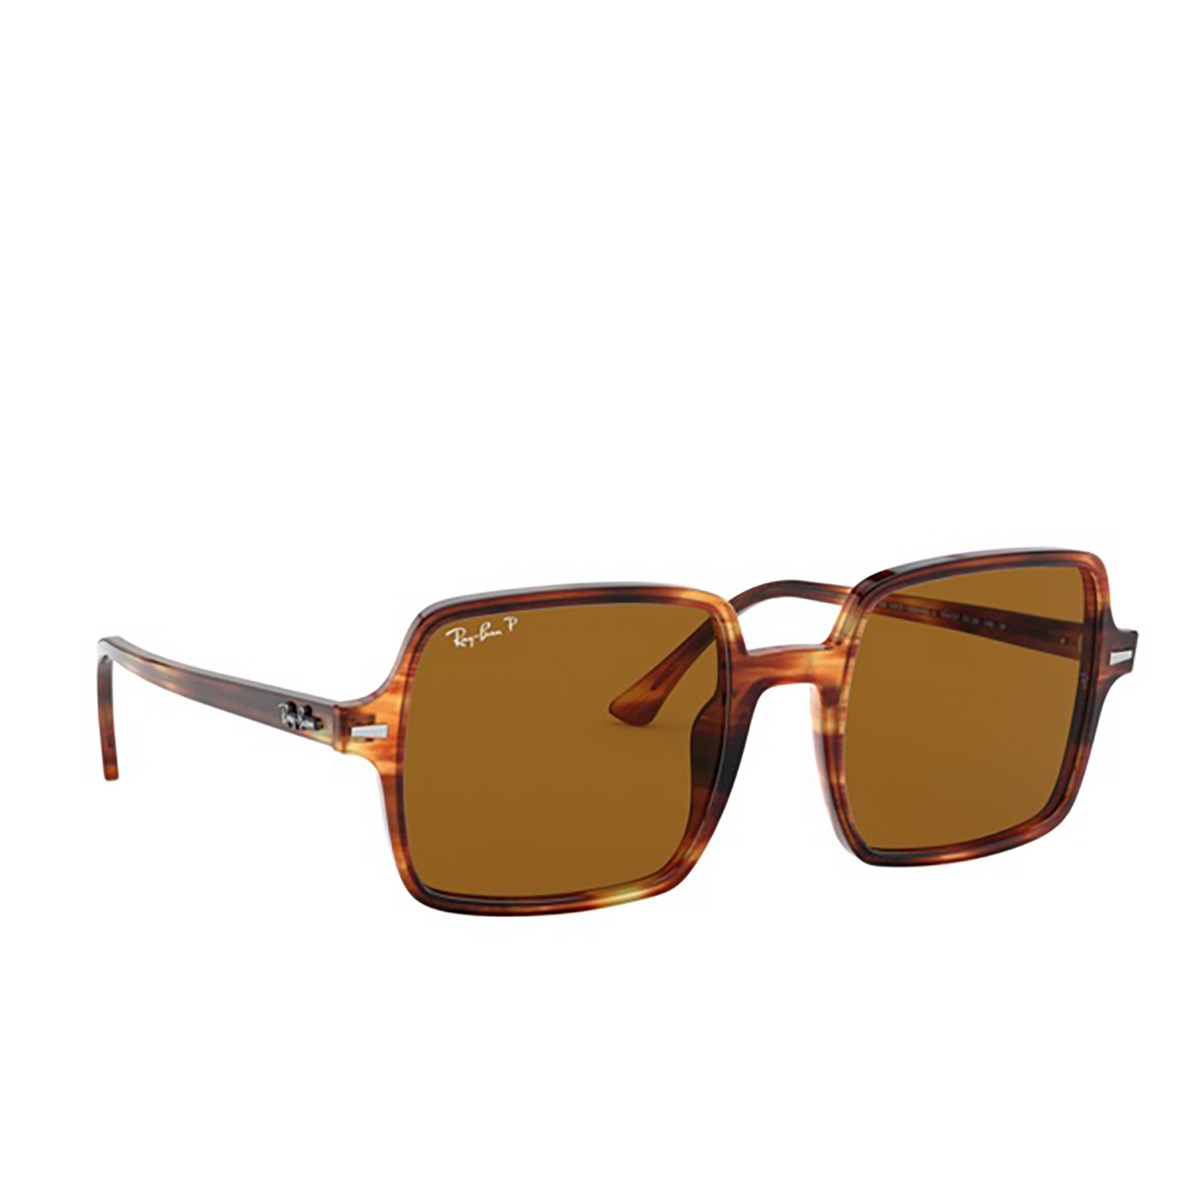 Ray-Ban® Square Sunglasses: Square Ii RB1973 color Striped Havana 954/57 - three-quarters view.